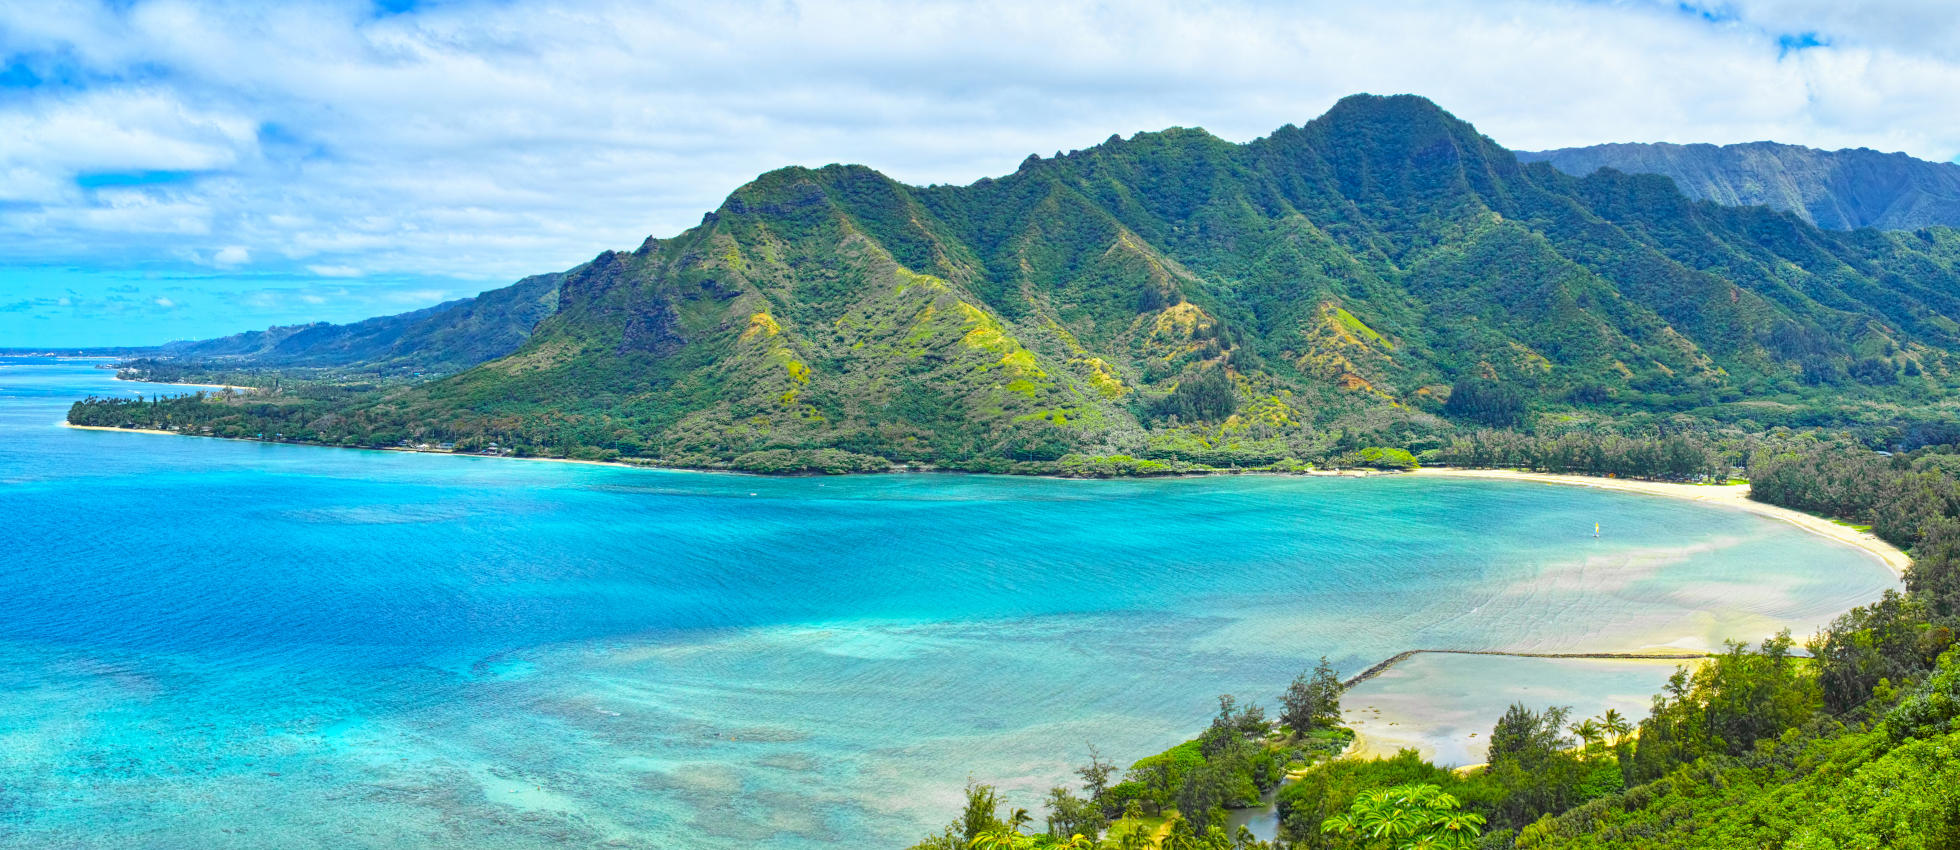 Gap Year Program - ARCC Gap   Hawaii: O'ahu, Kauai & the Big Island  2